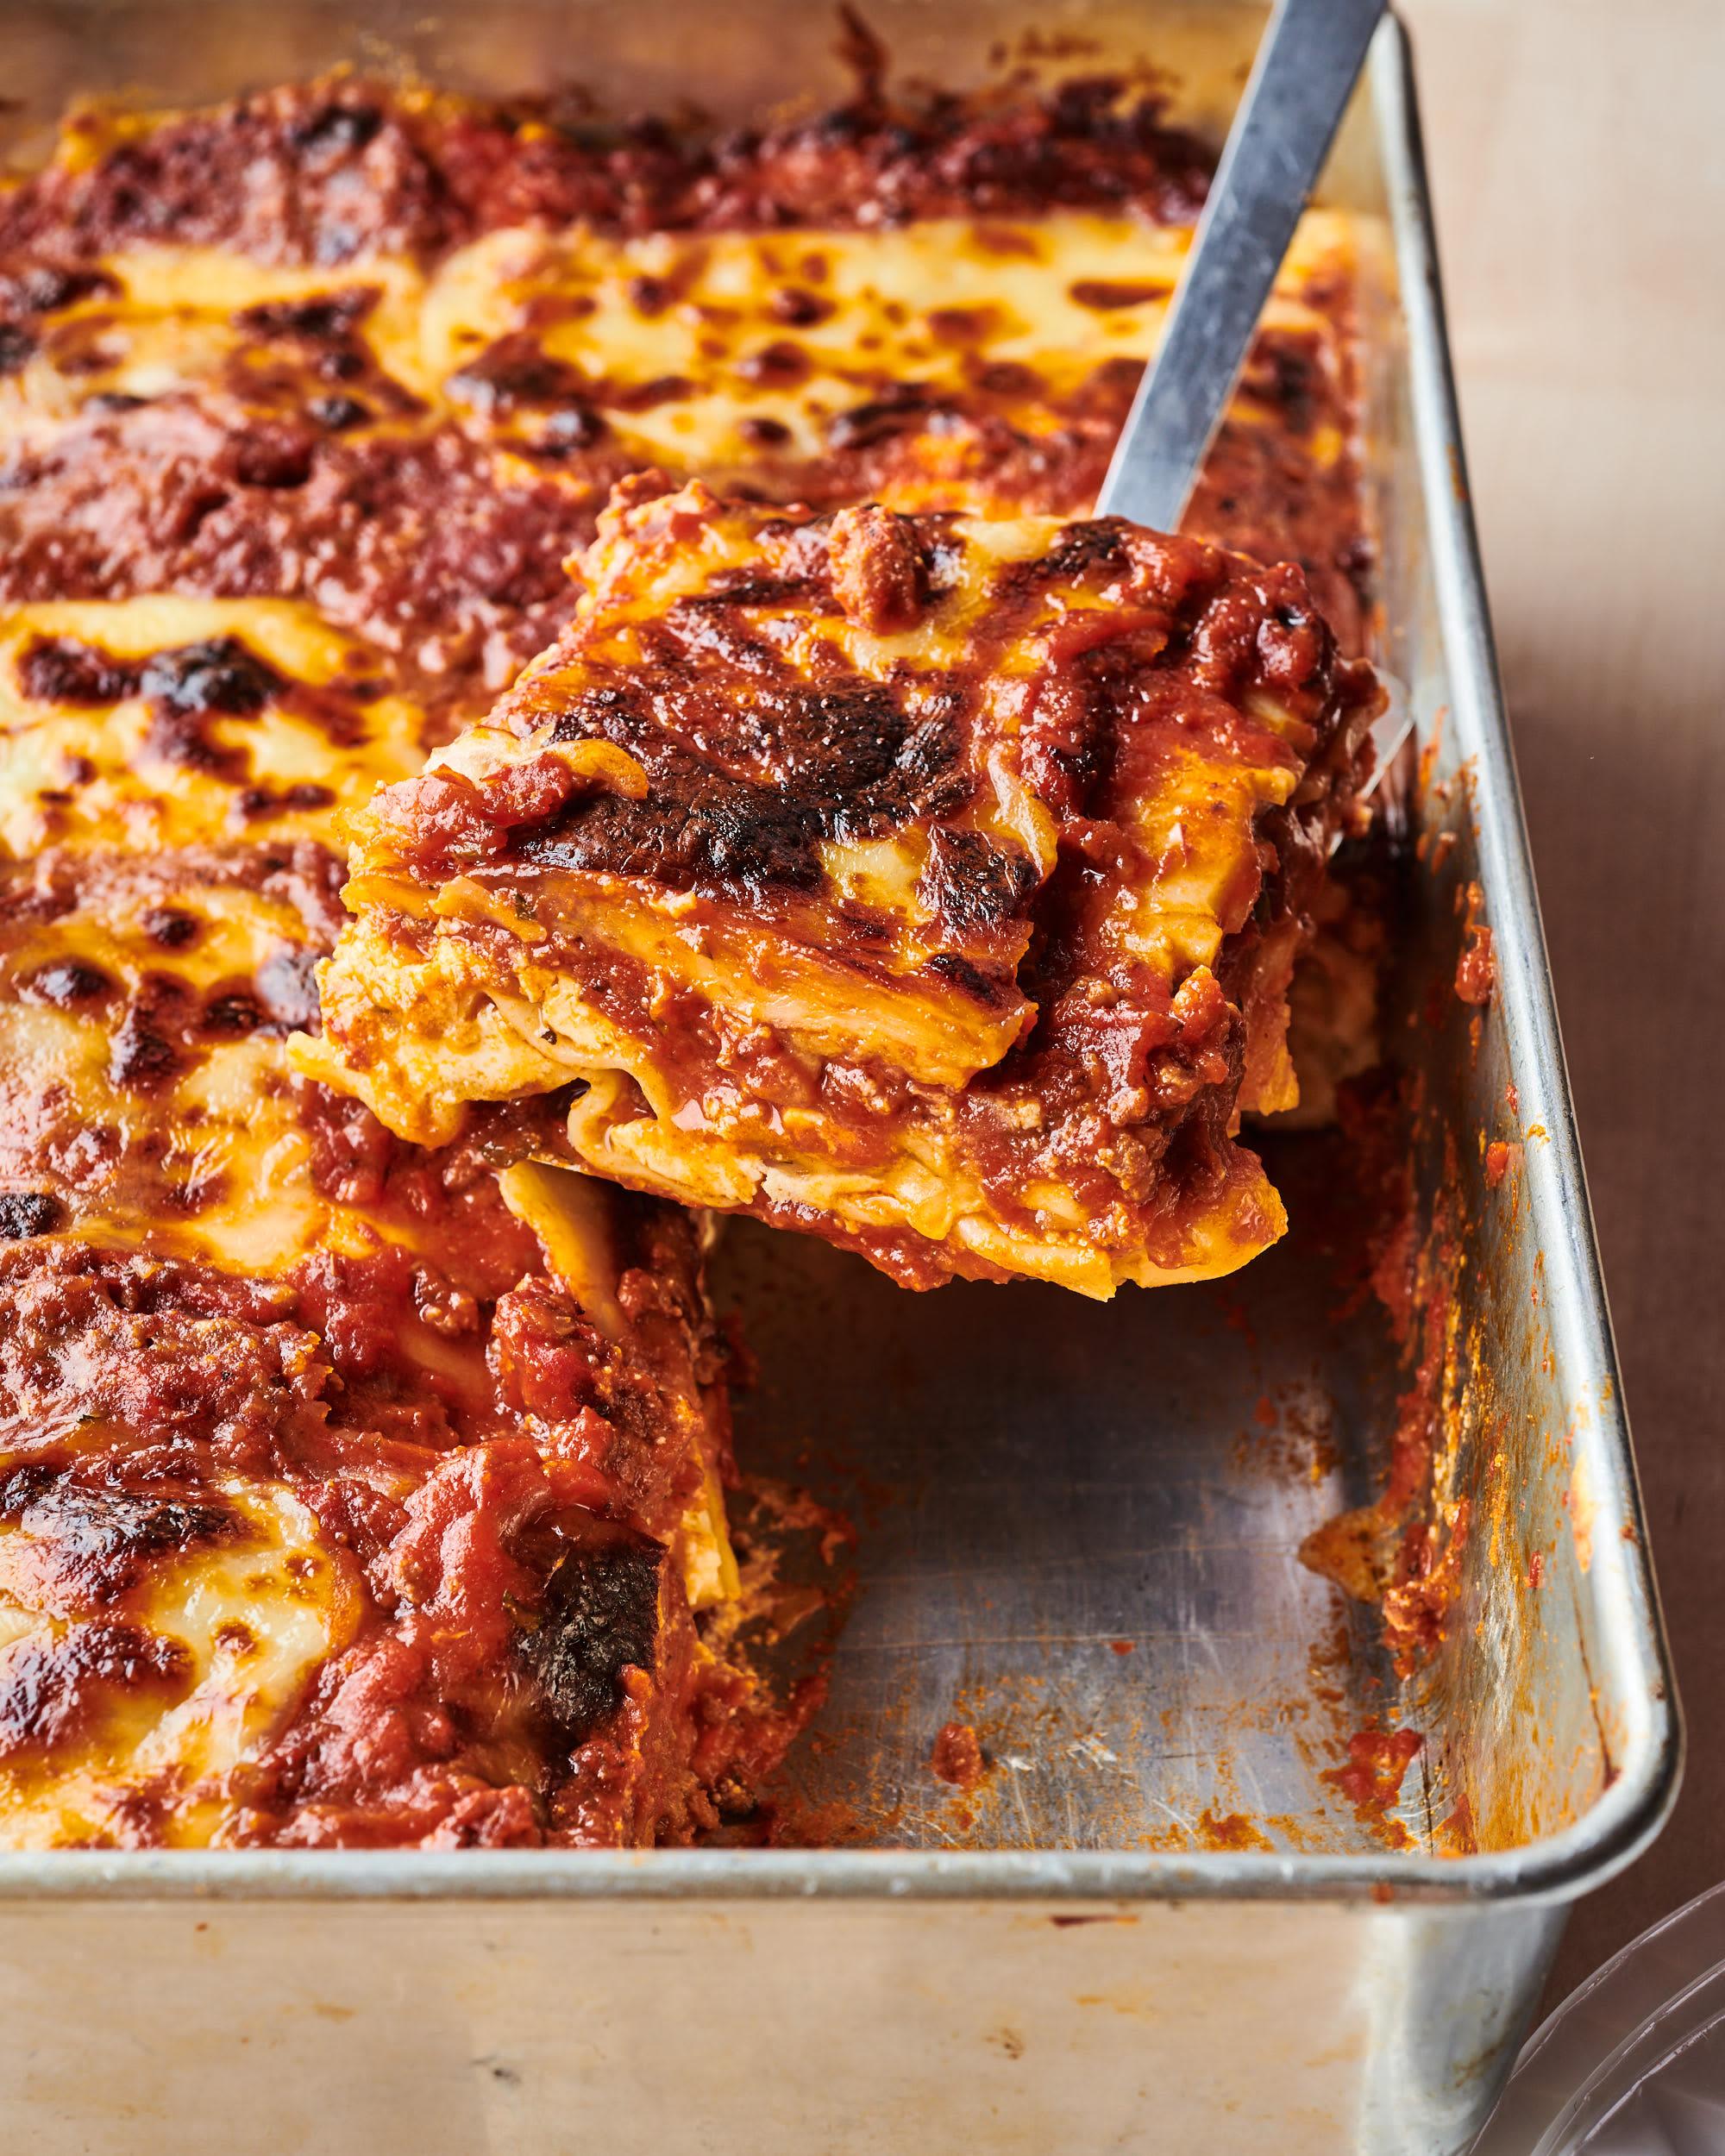 I Tried Allrecipes' World's Best Lasagna   Kitchn